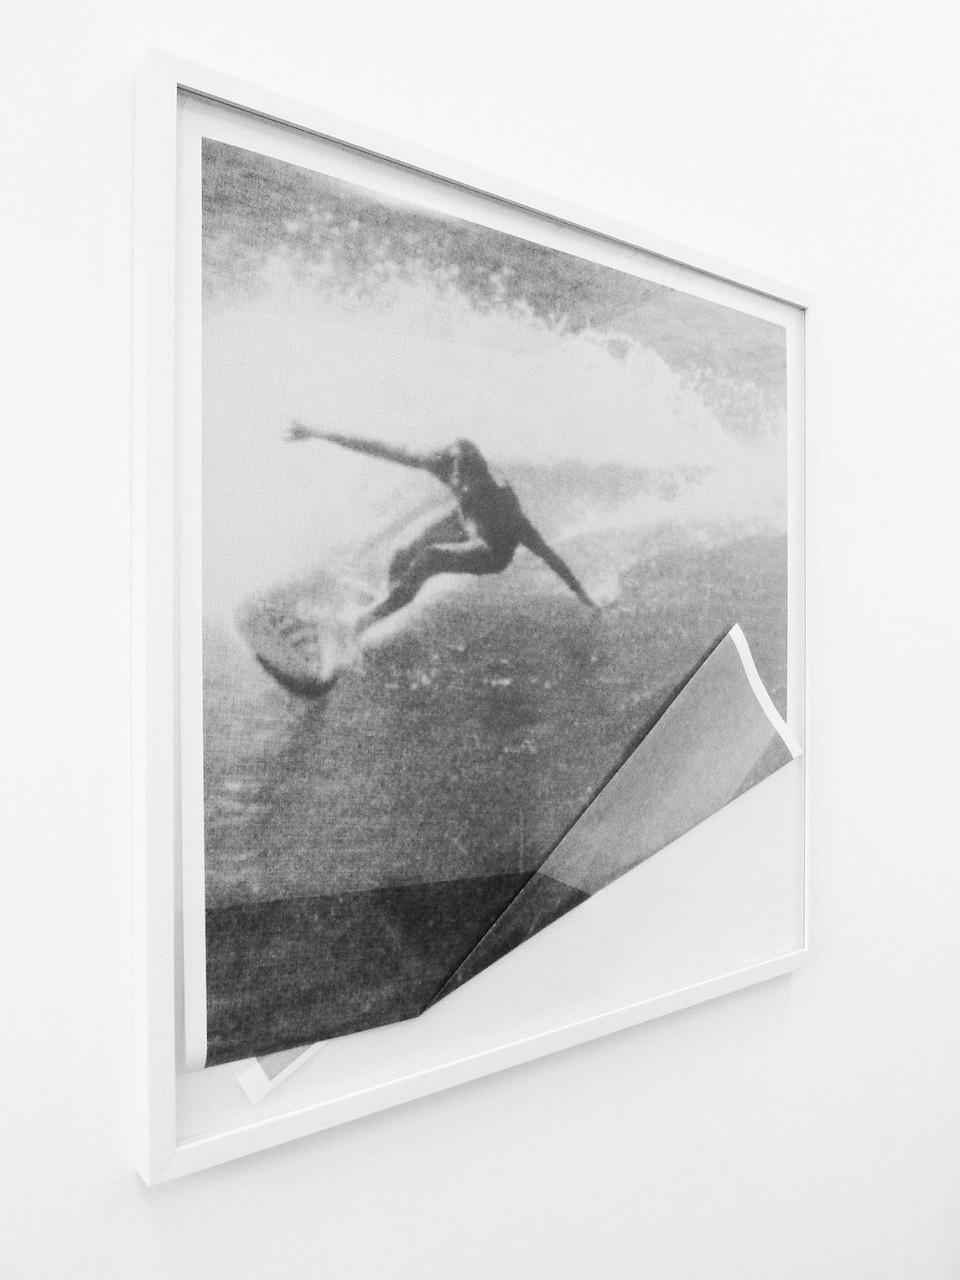 Untitled (Surfer I), 2013, Inkjet Print (gefaltet), 100 x 100 cm